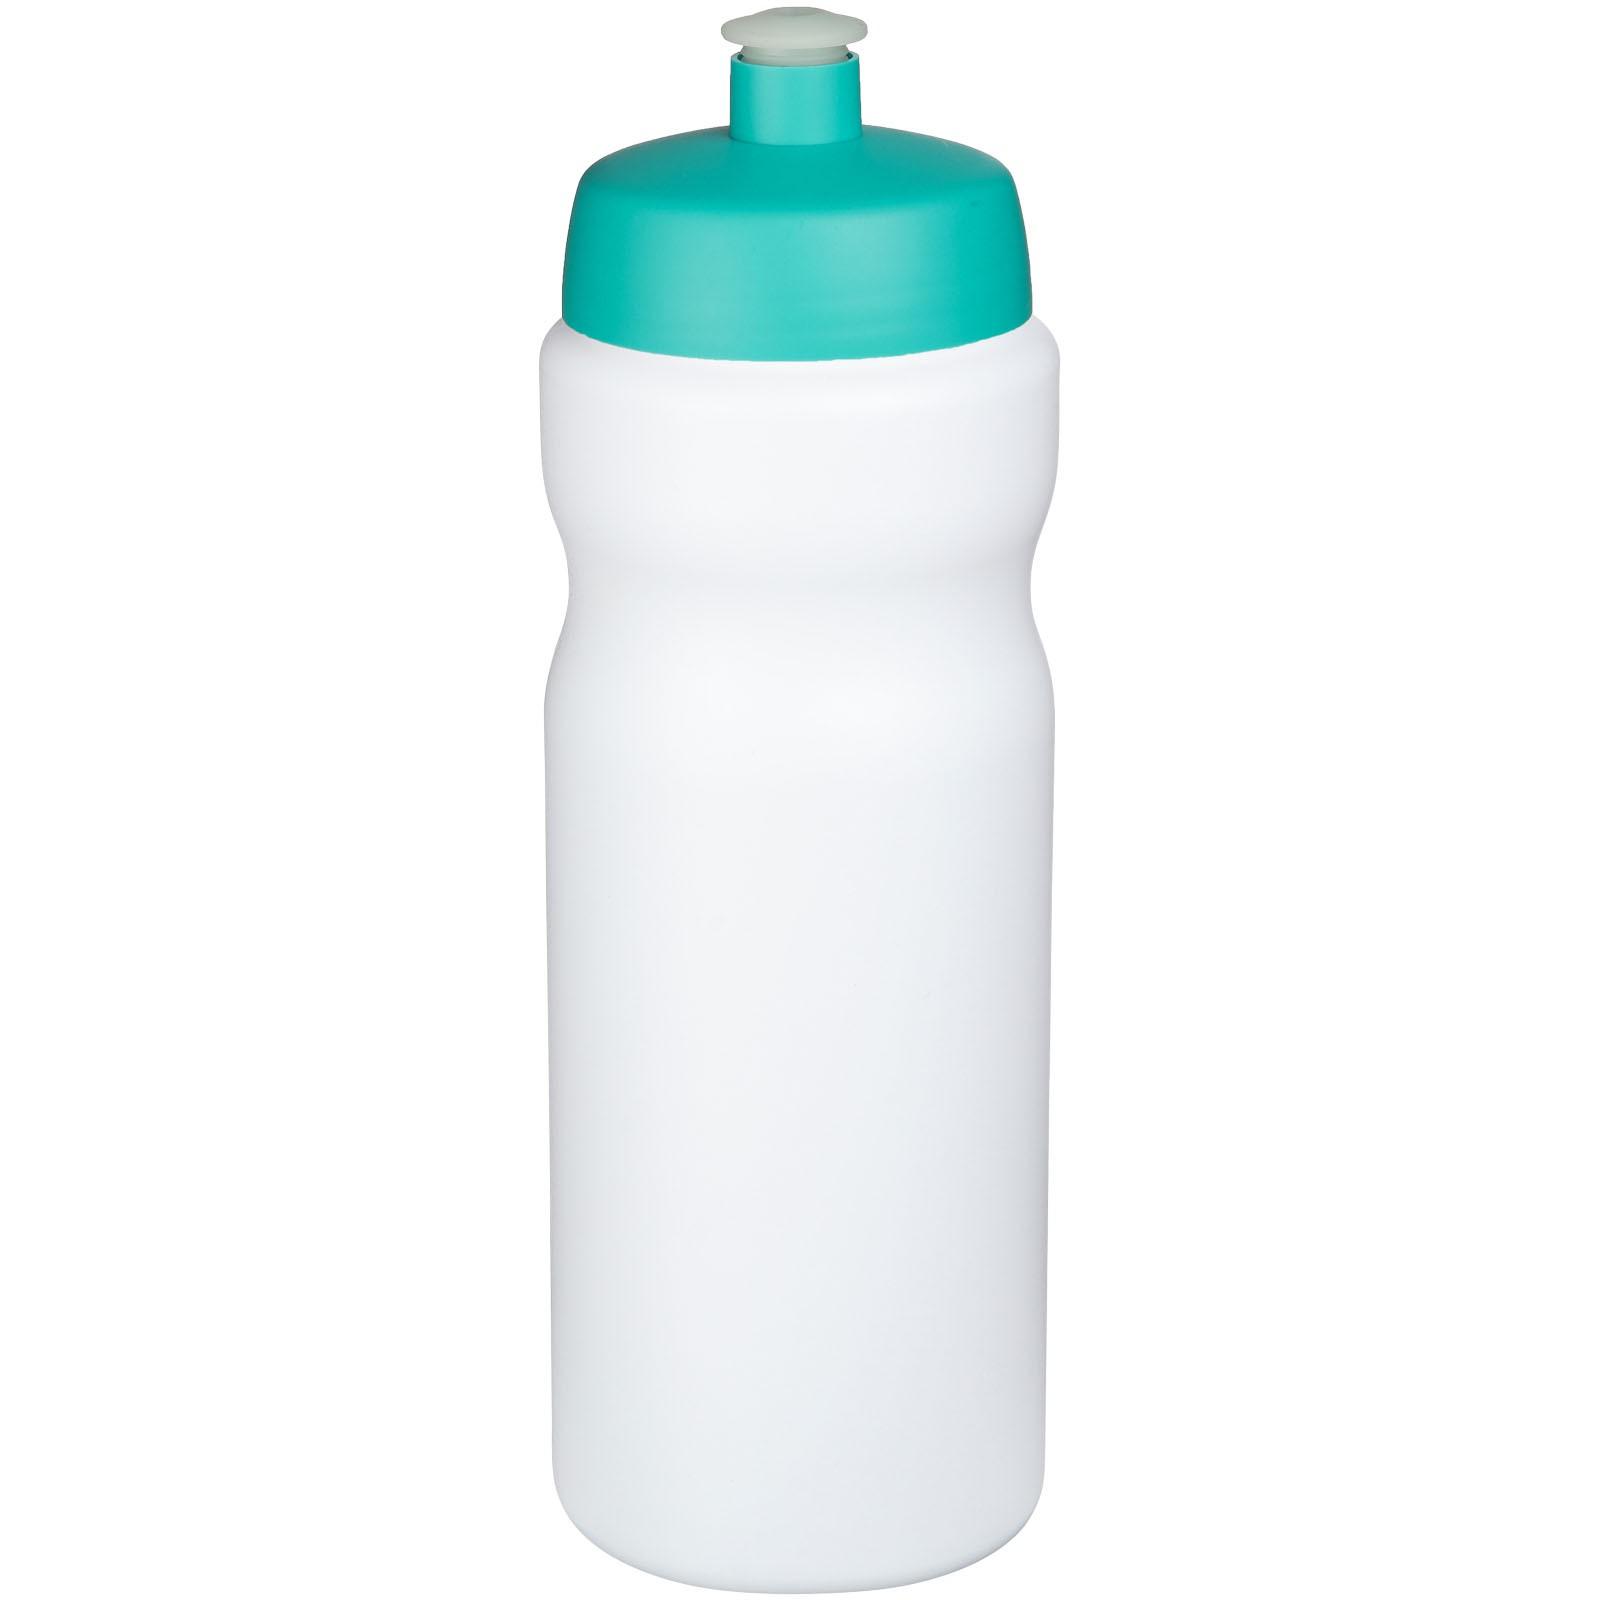 Baseline® Plus 650 ml sport bottle - White / Aqua